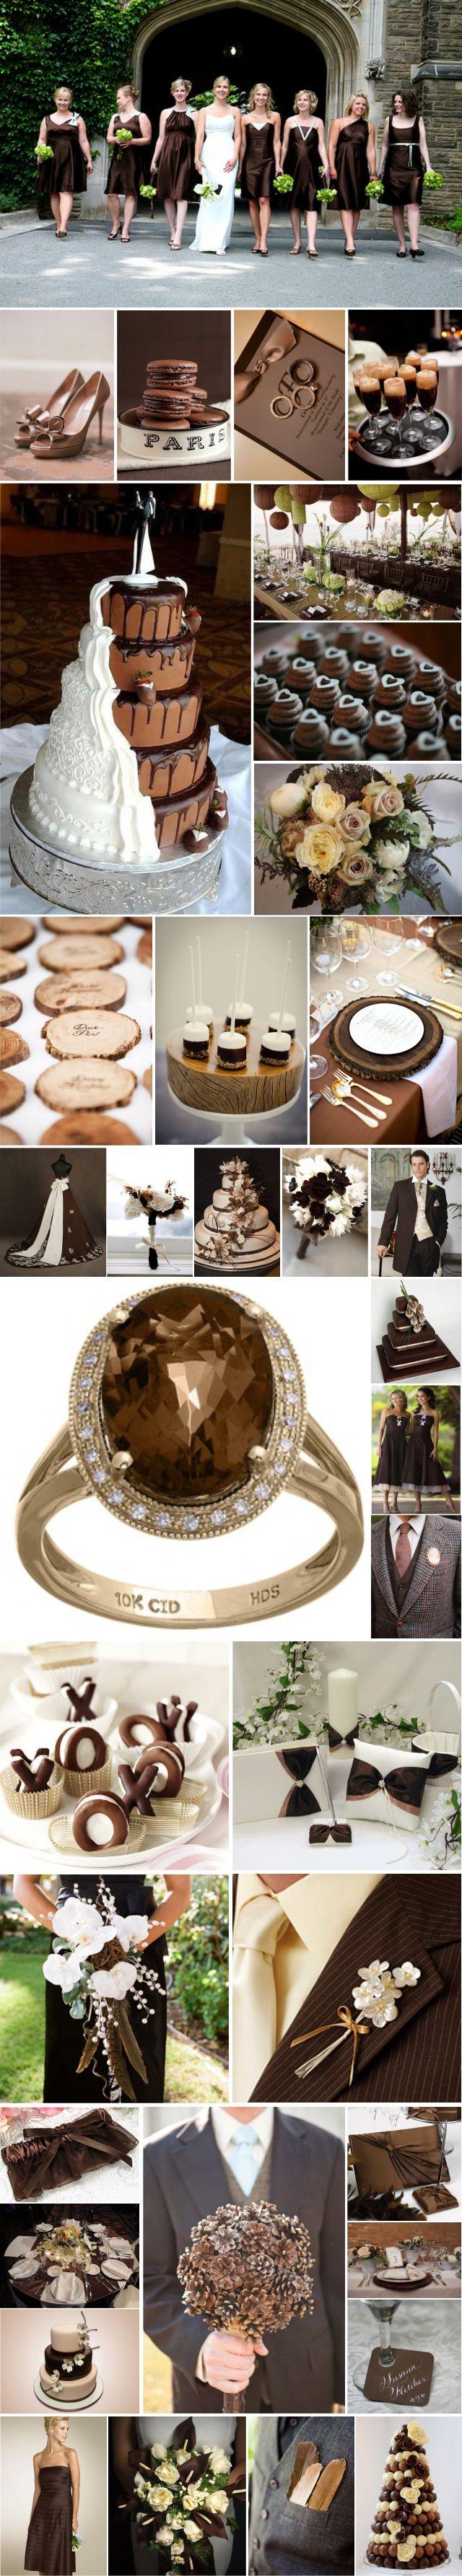 Brown wedding inspiration